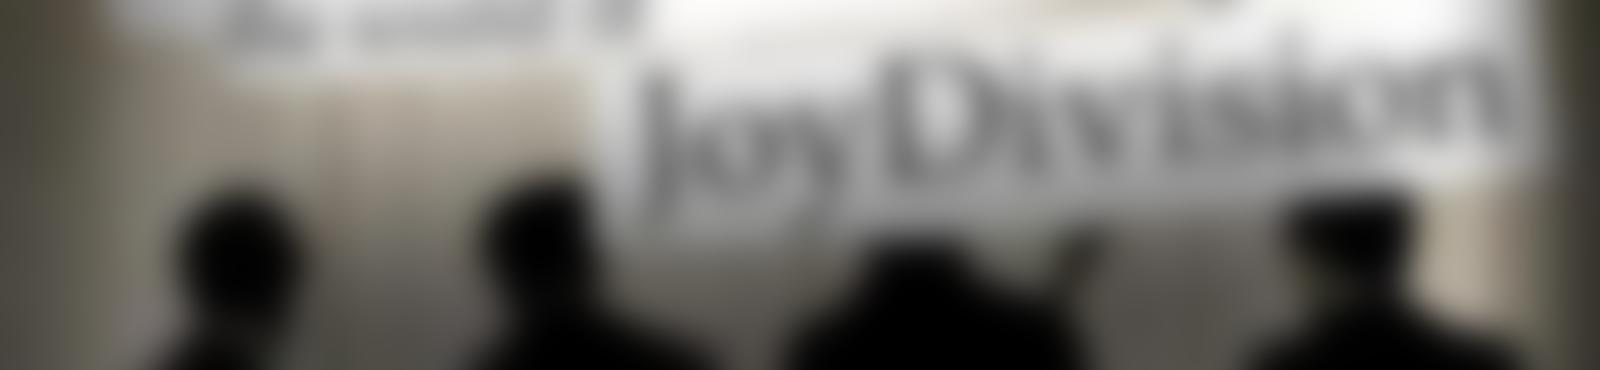 Blurred c249f6dd ac4f 4341 98e5 c3cefa95492e